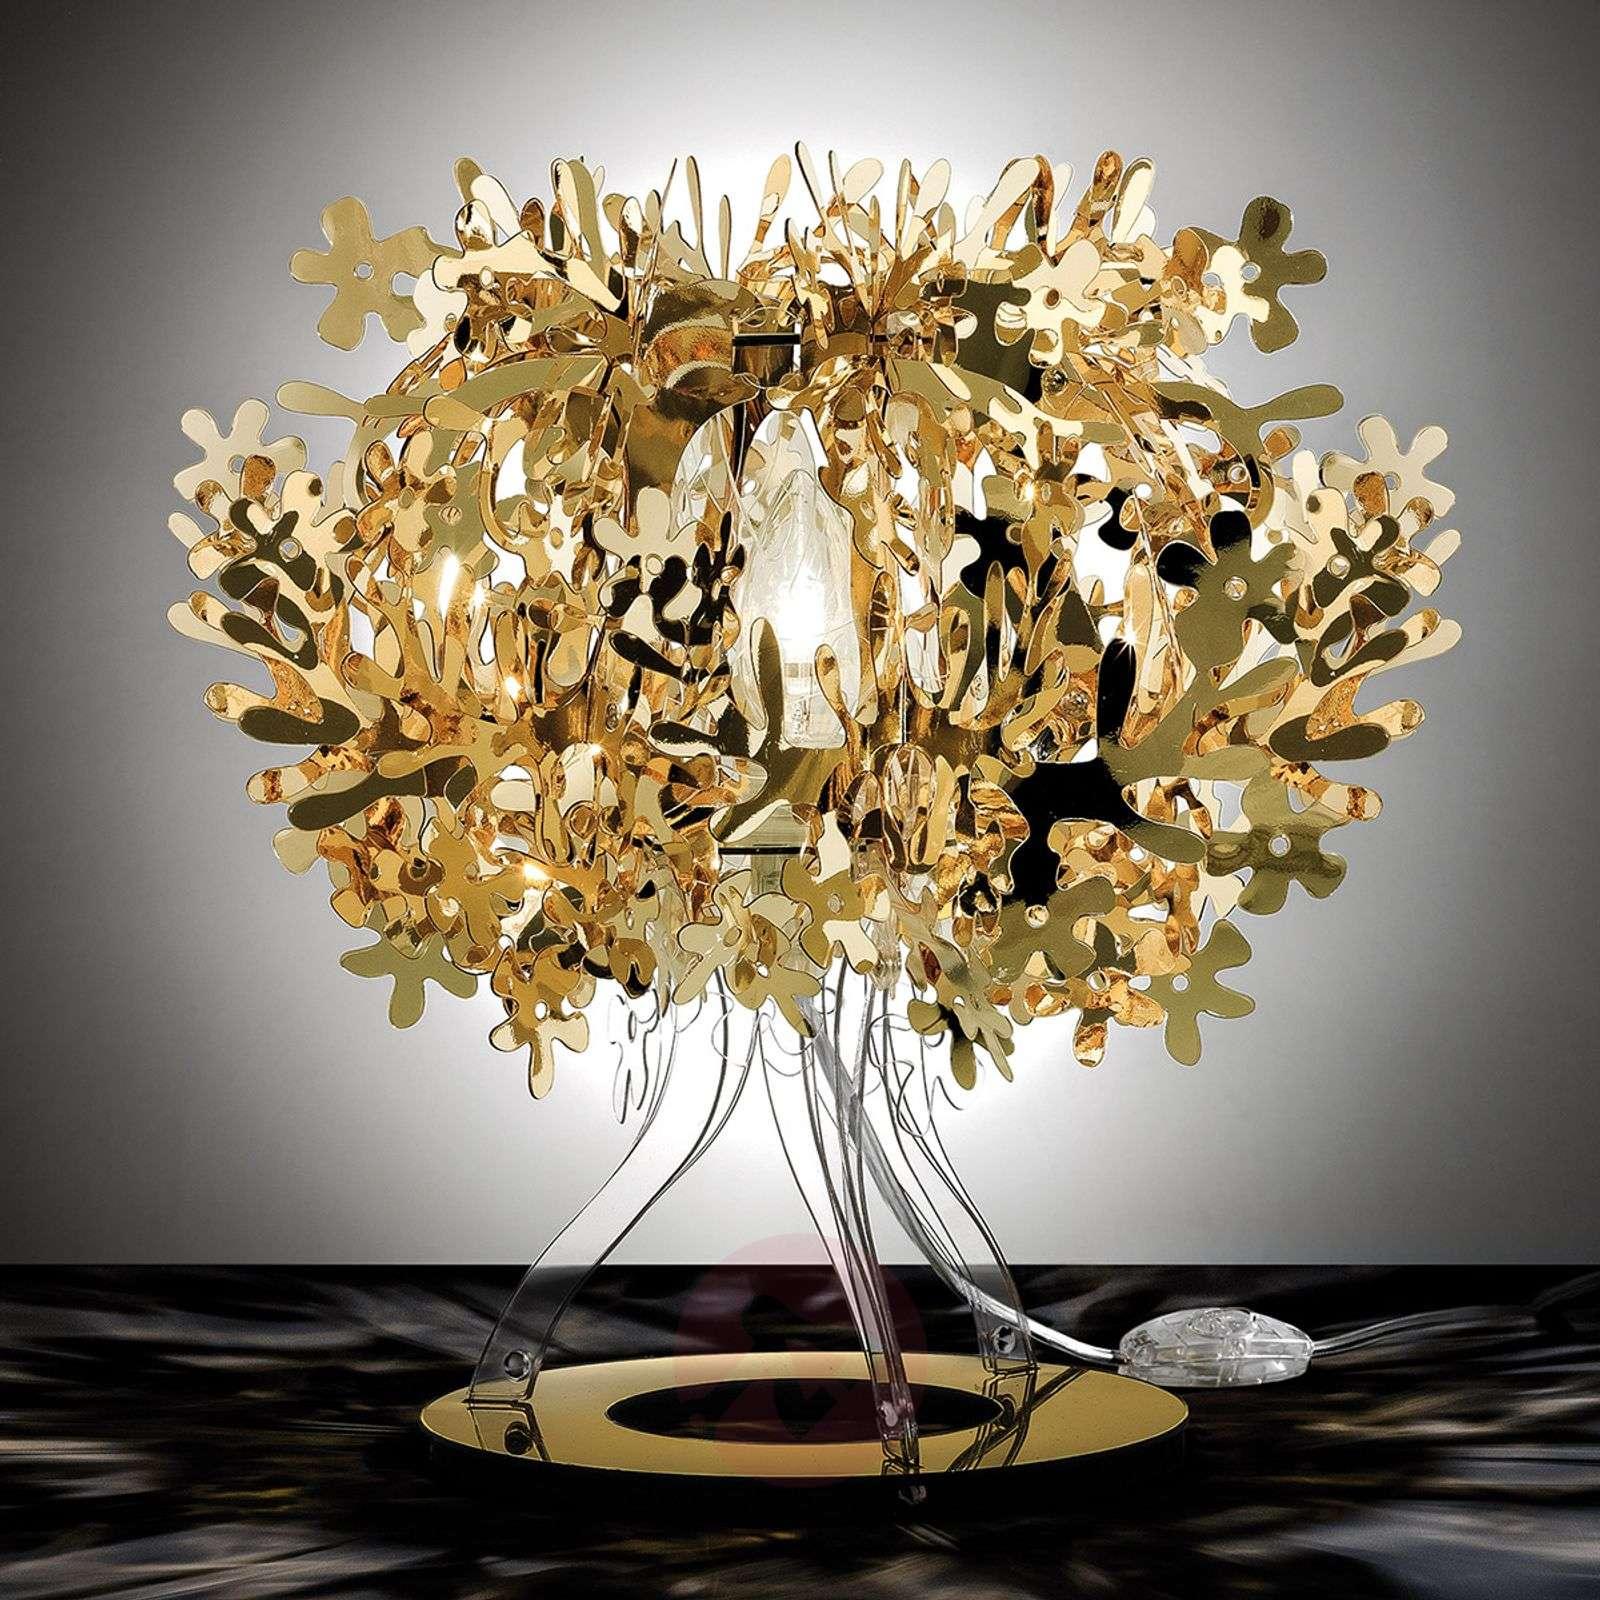 Fiorellina designer table lamp in gold-8503246-01